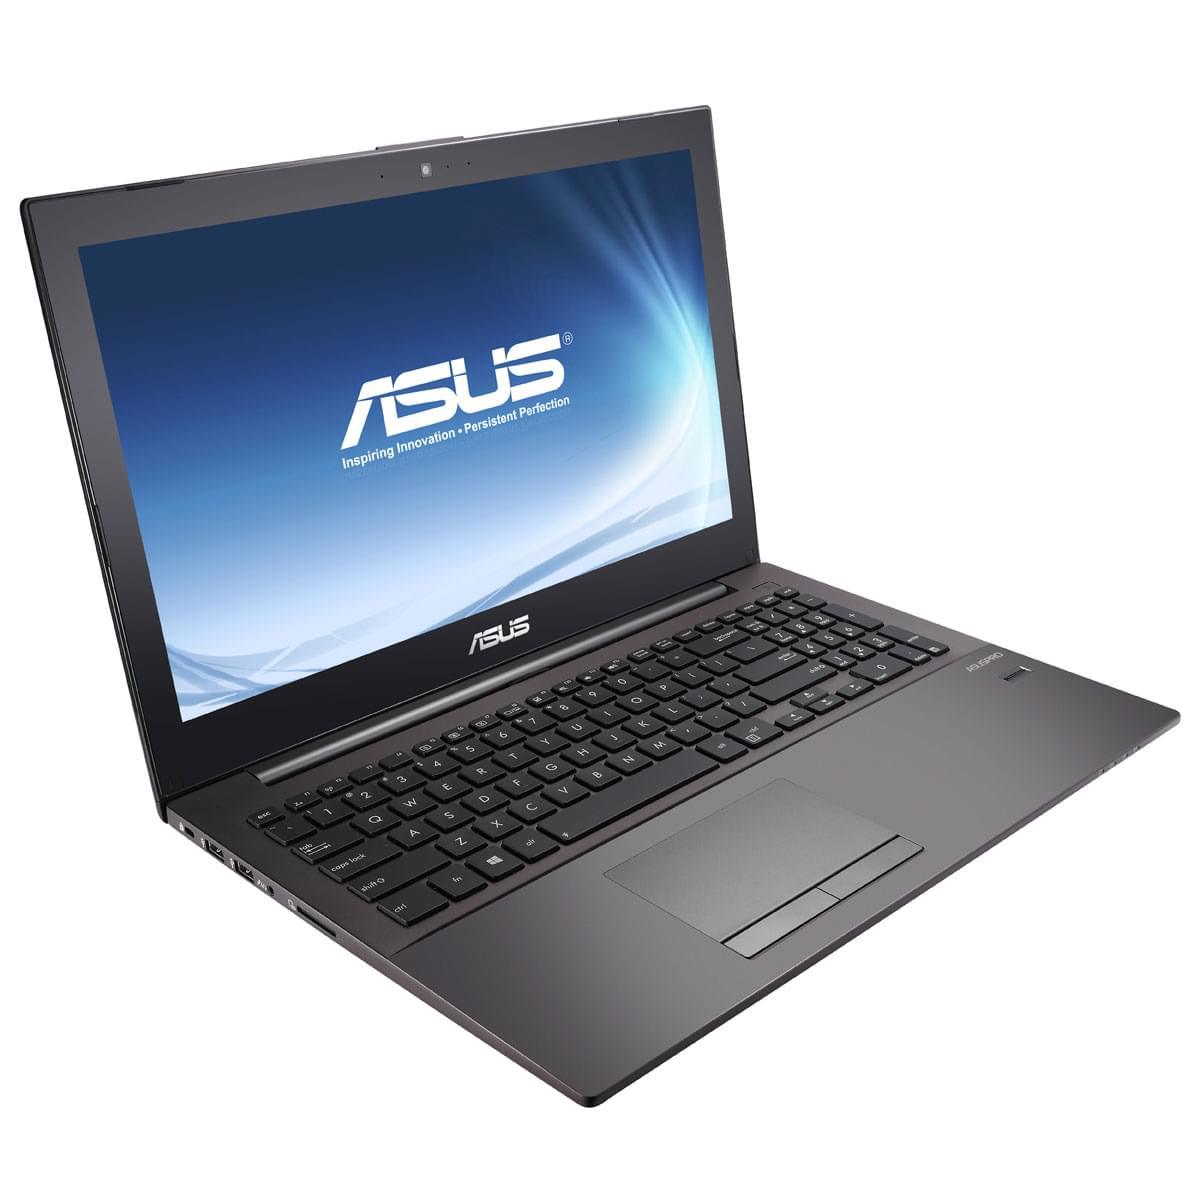 Asus PU500CA-XO002G (PU500CA-XO002G) - Achat / Vente PC Portable sur Cybertek.fr - 0